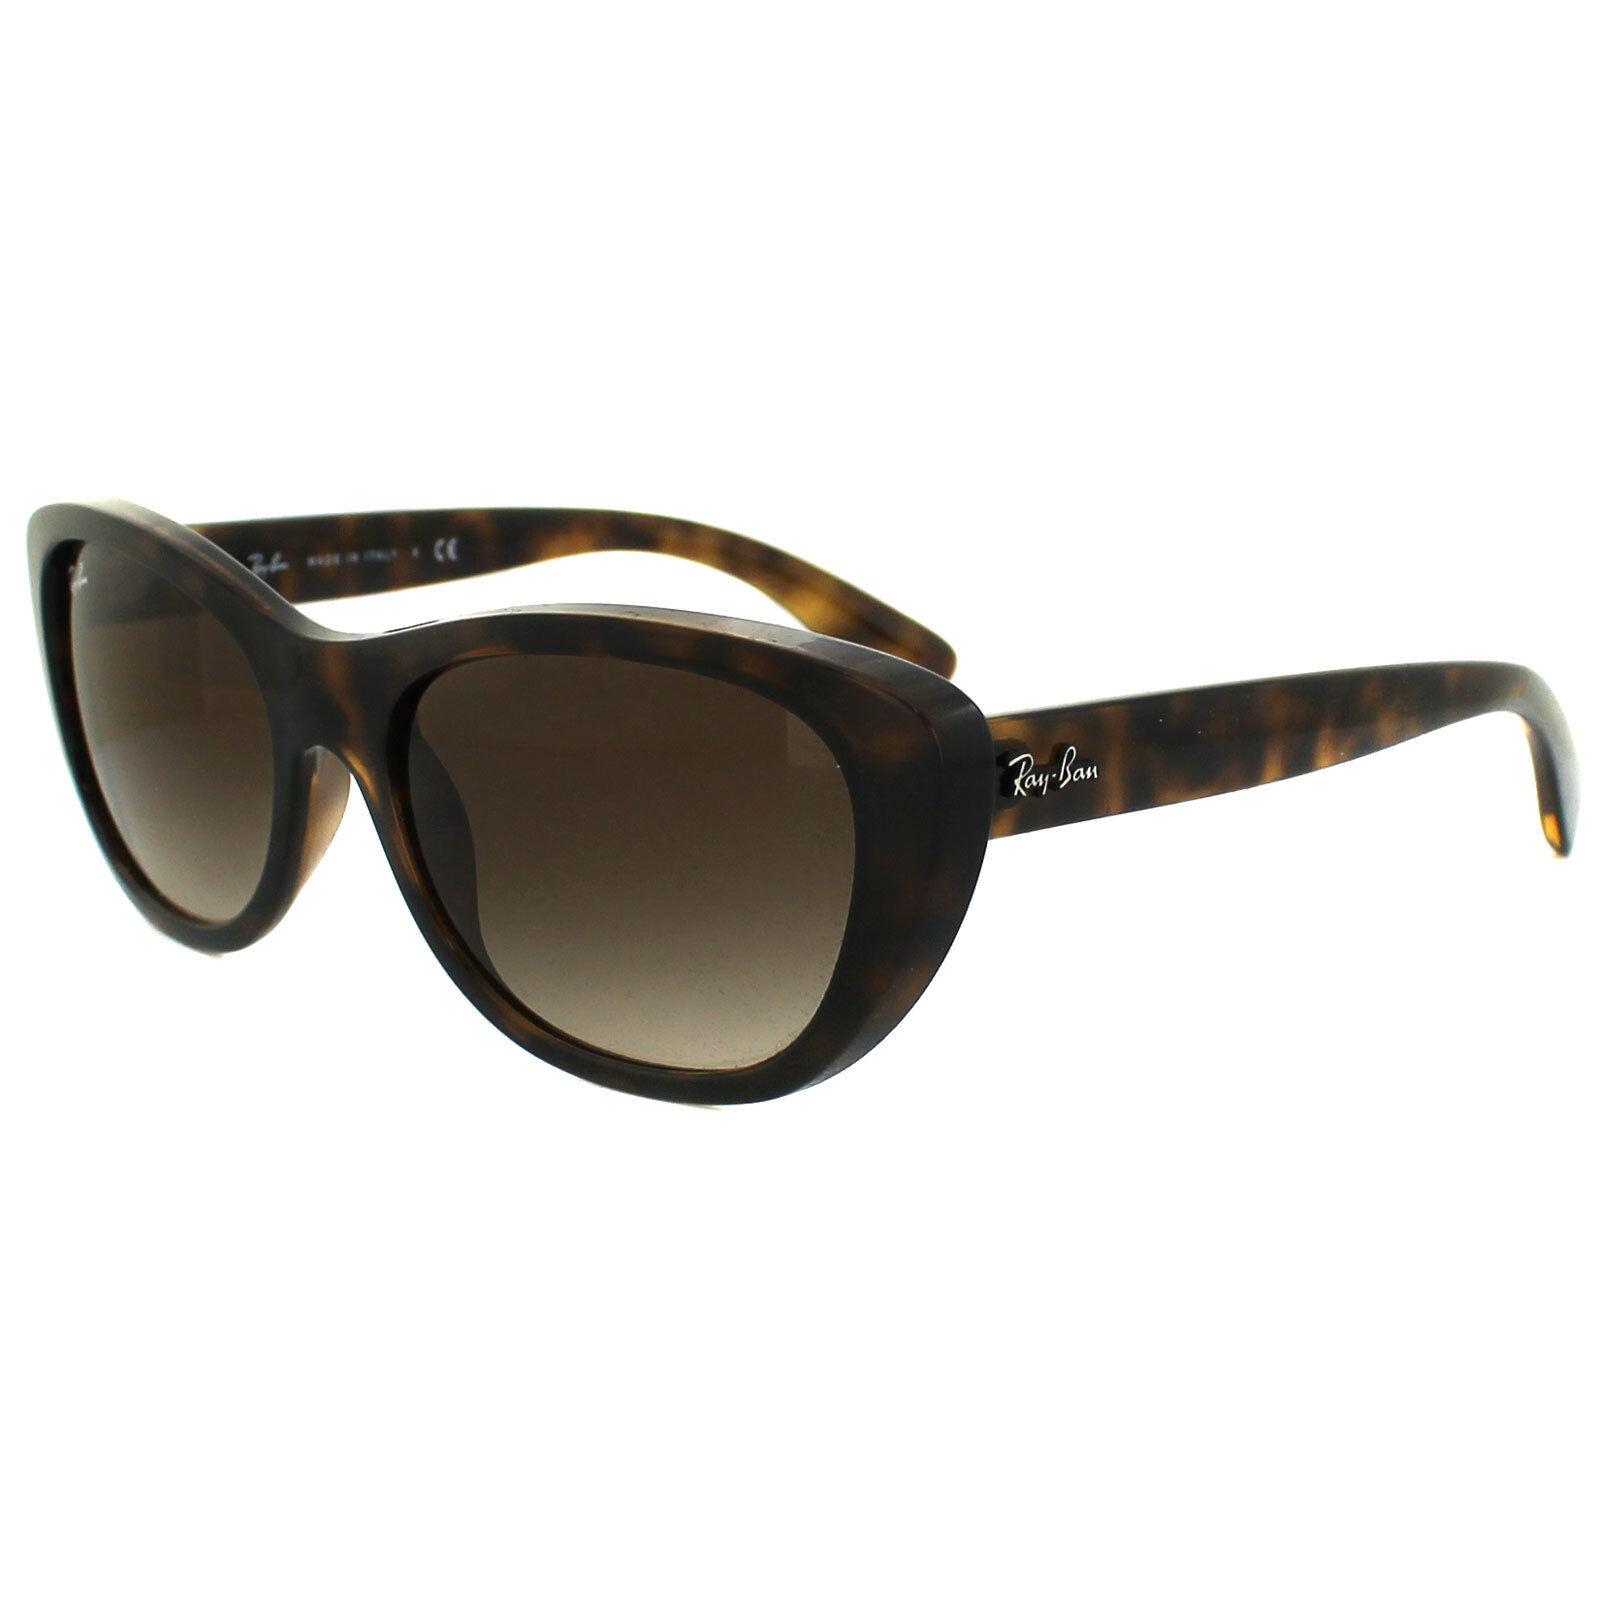 b0bd30e180 Genuine Ray-Ban Rb4227 710 13 55 Brown Gradient Lens Sunglasses - Tortoise